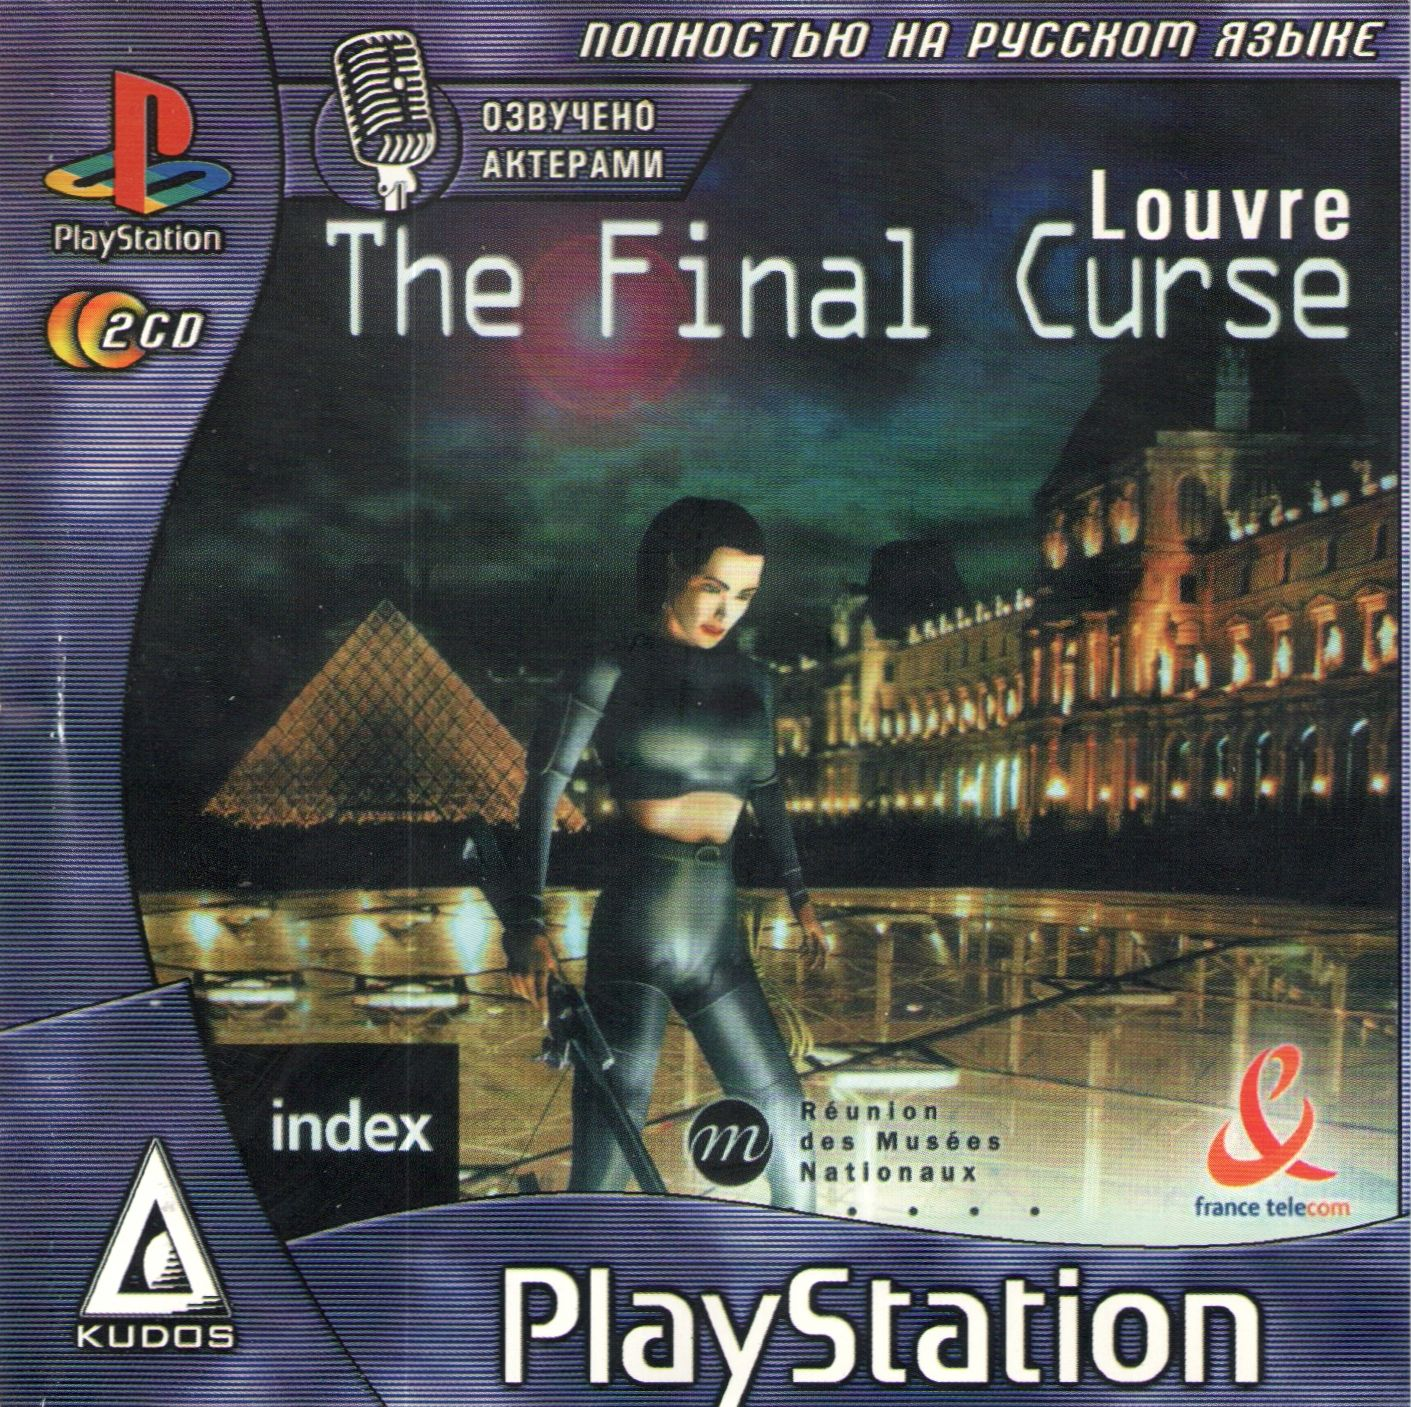 Louvre The Final Curse